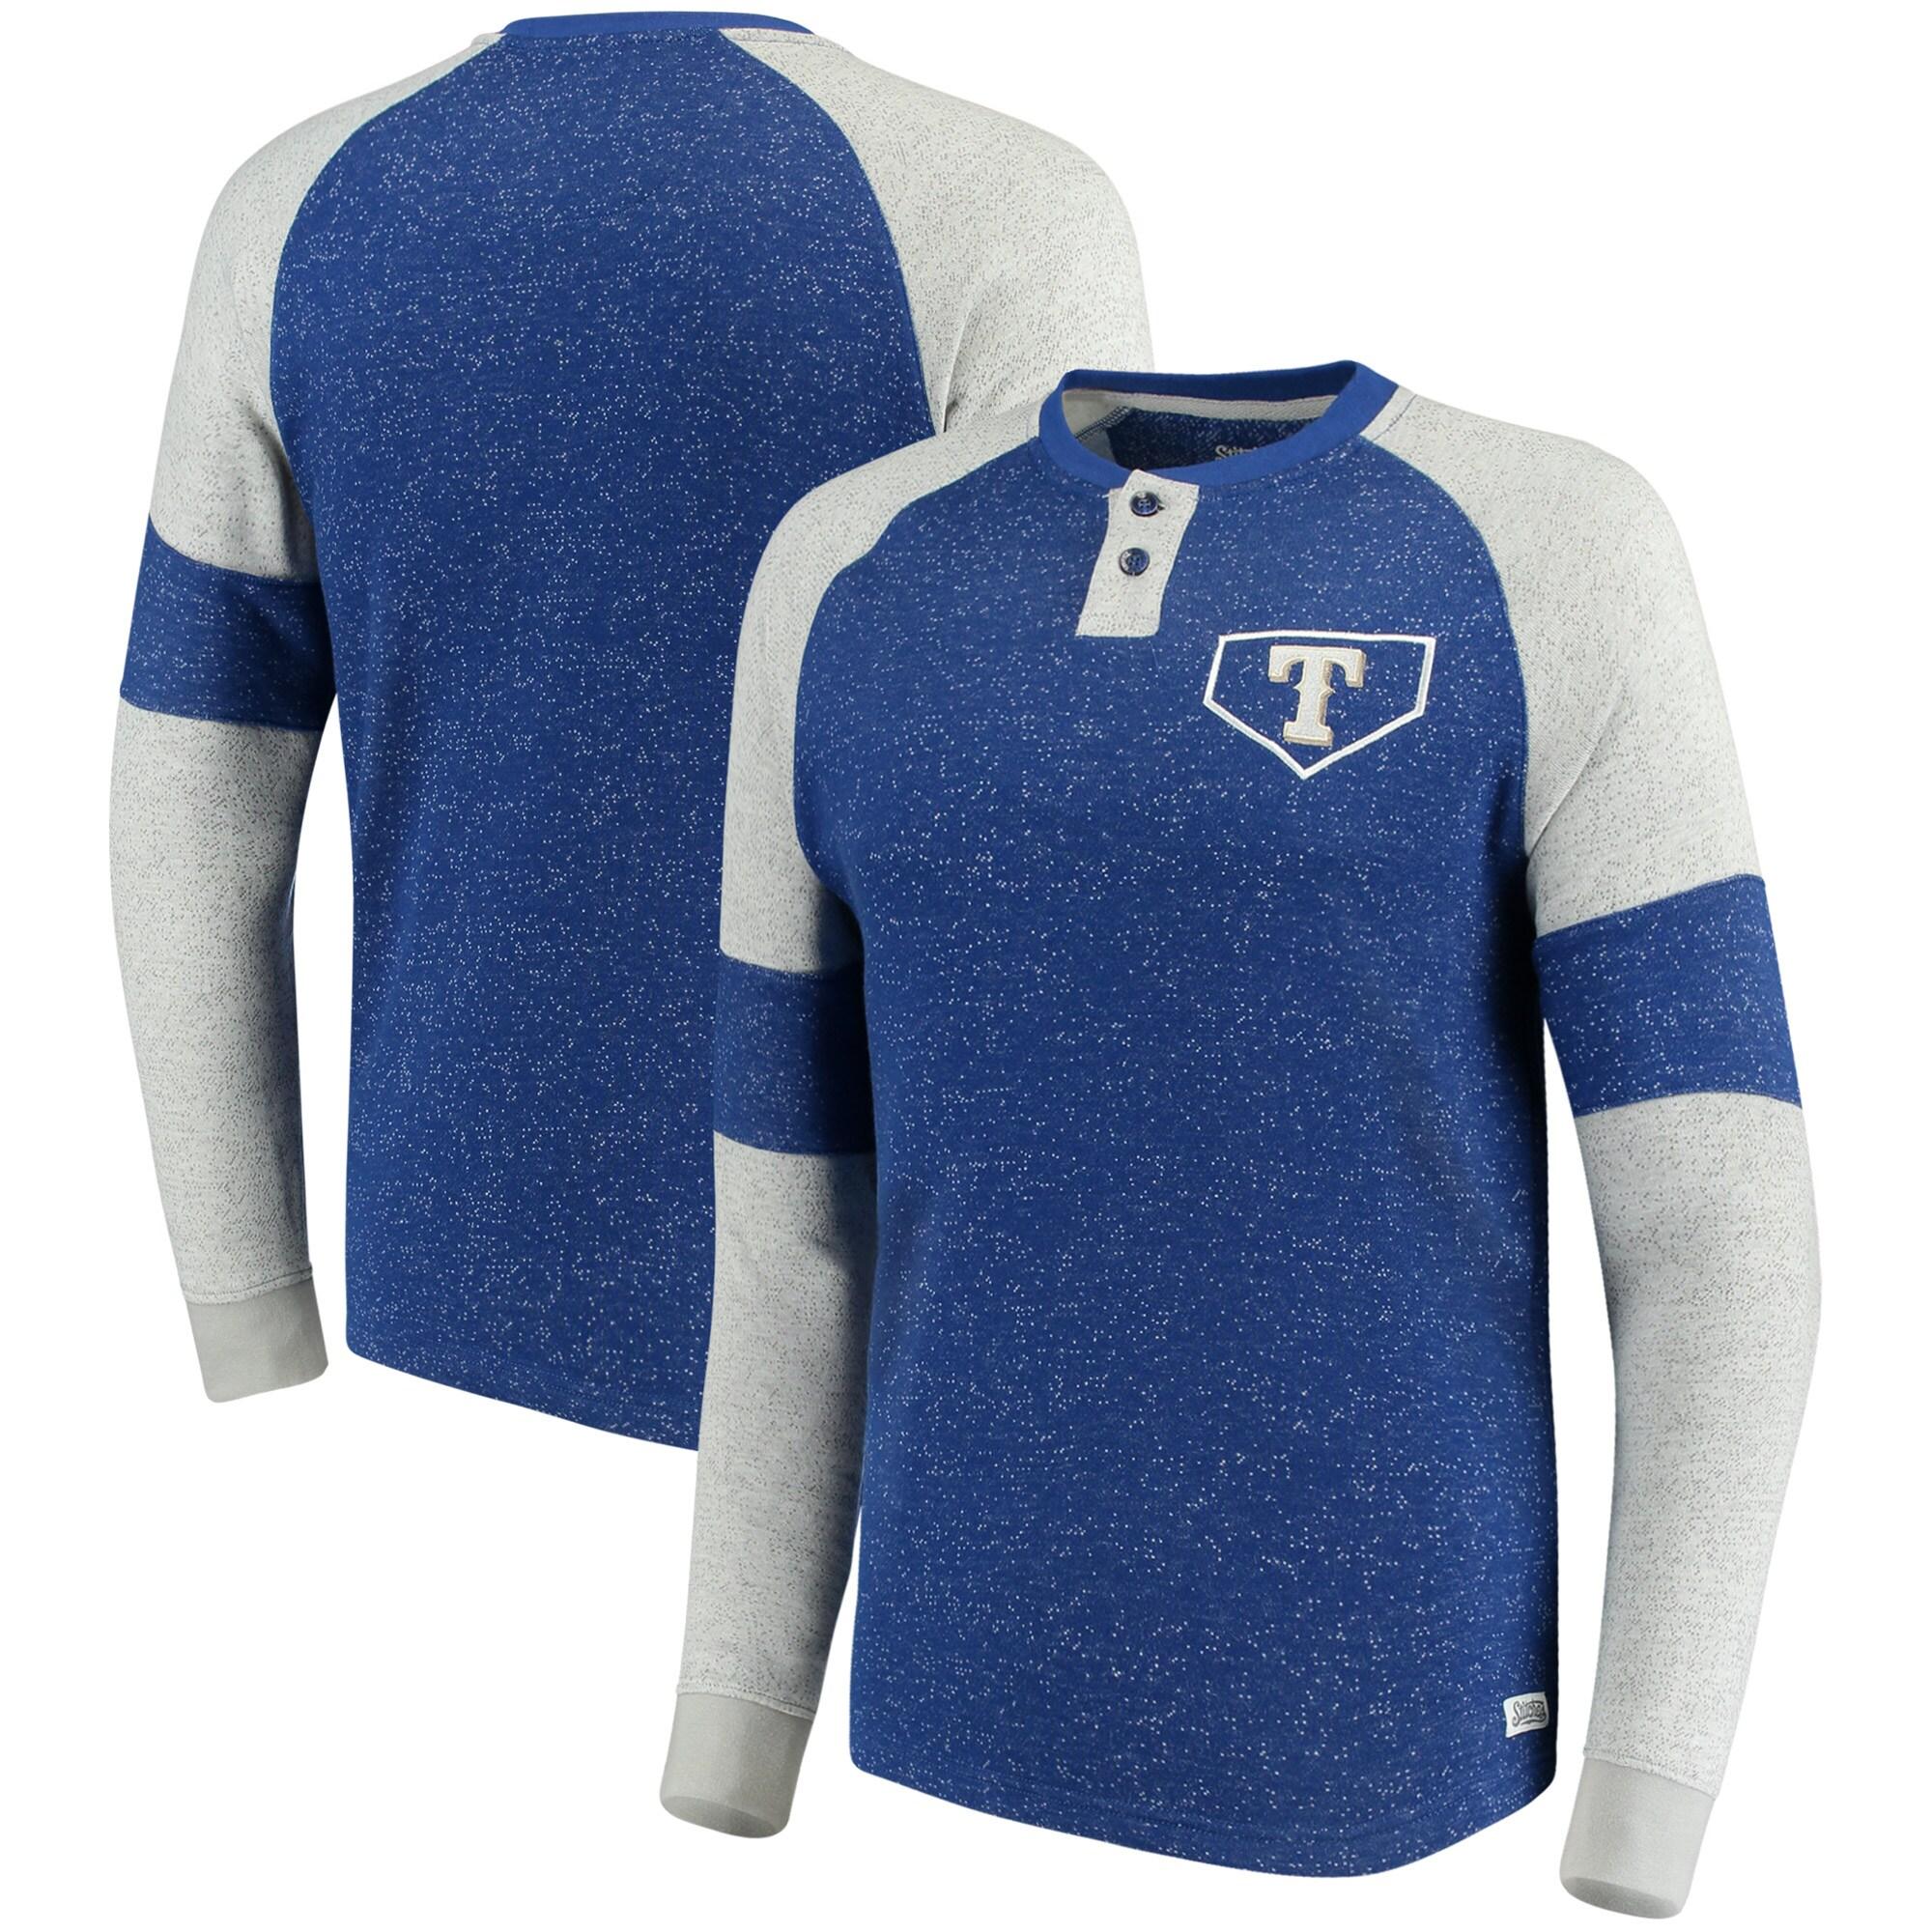 Texas Rangers Stitches Twisted Yarn Henley Long Sleeve T-Shirt - Royal